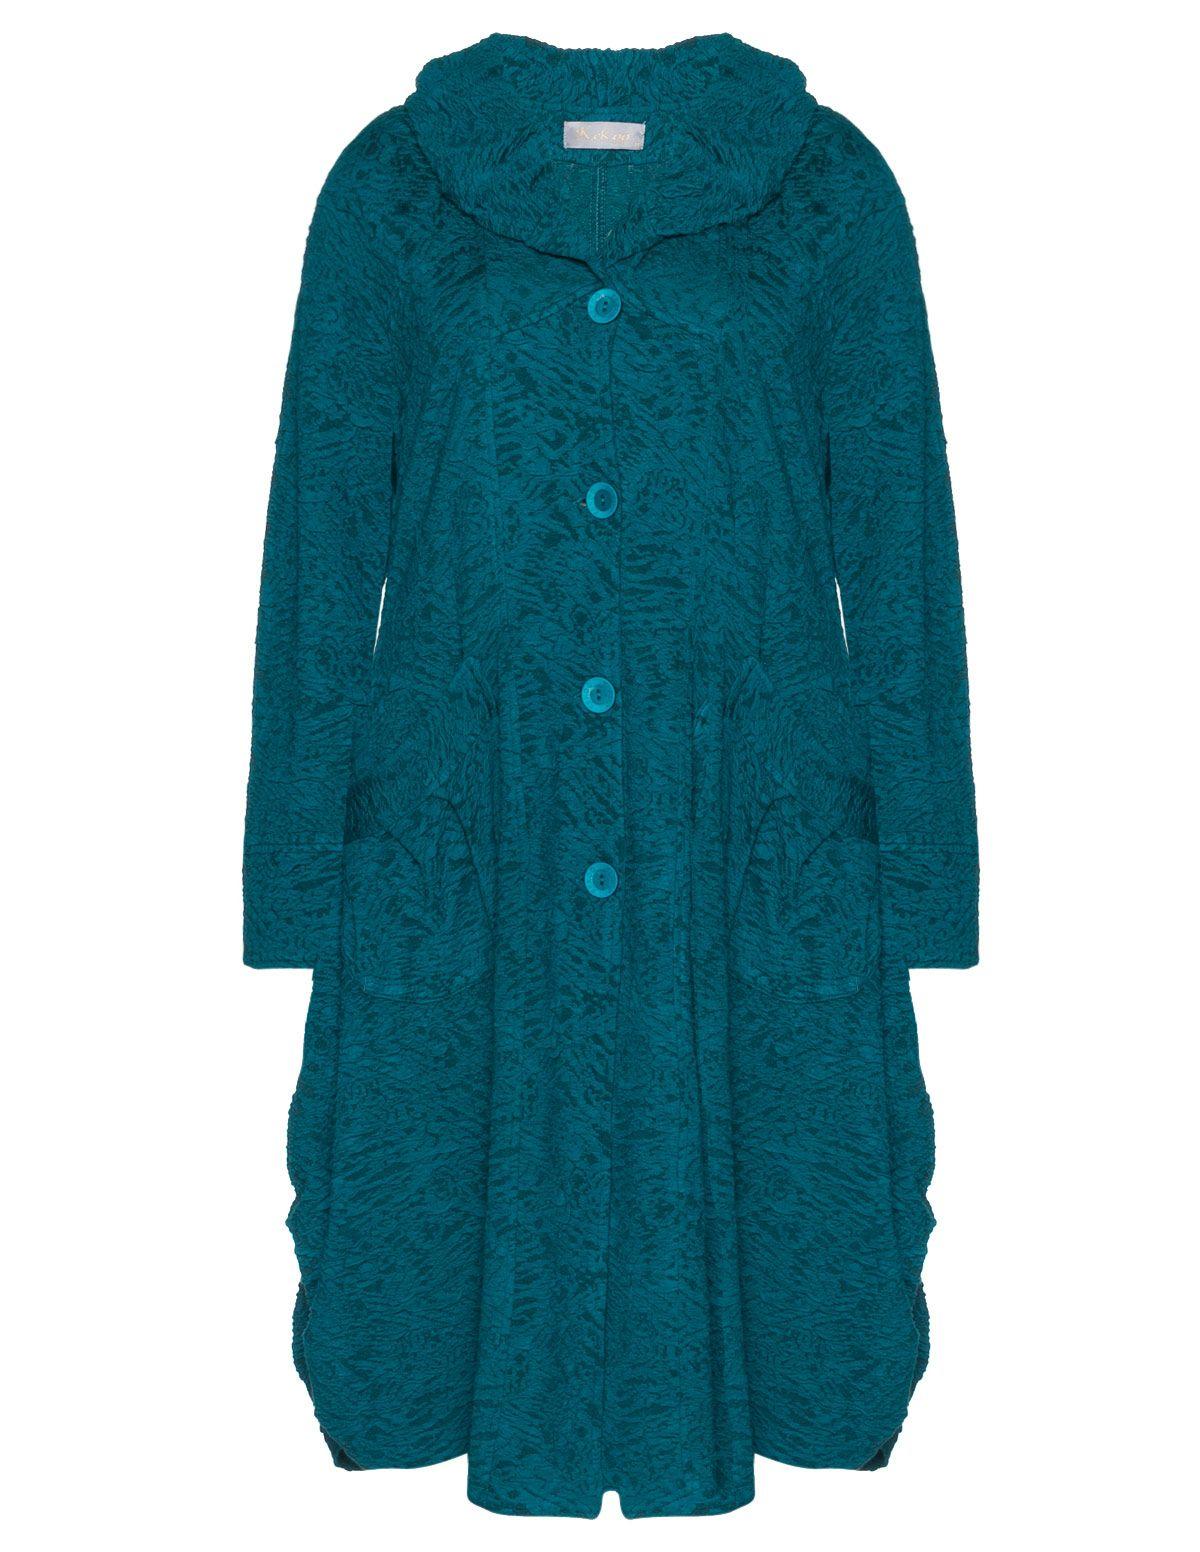 Kekoo Coat With Textured Pattern Navabi Lagenlook